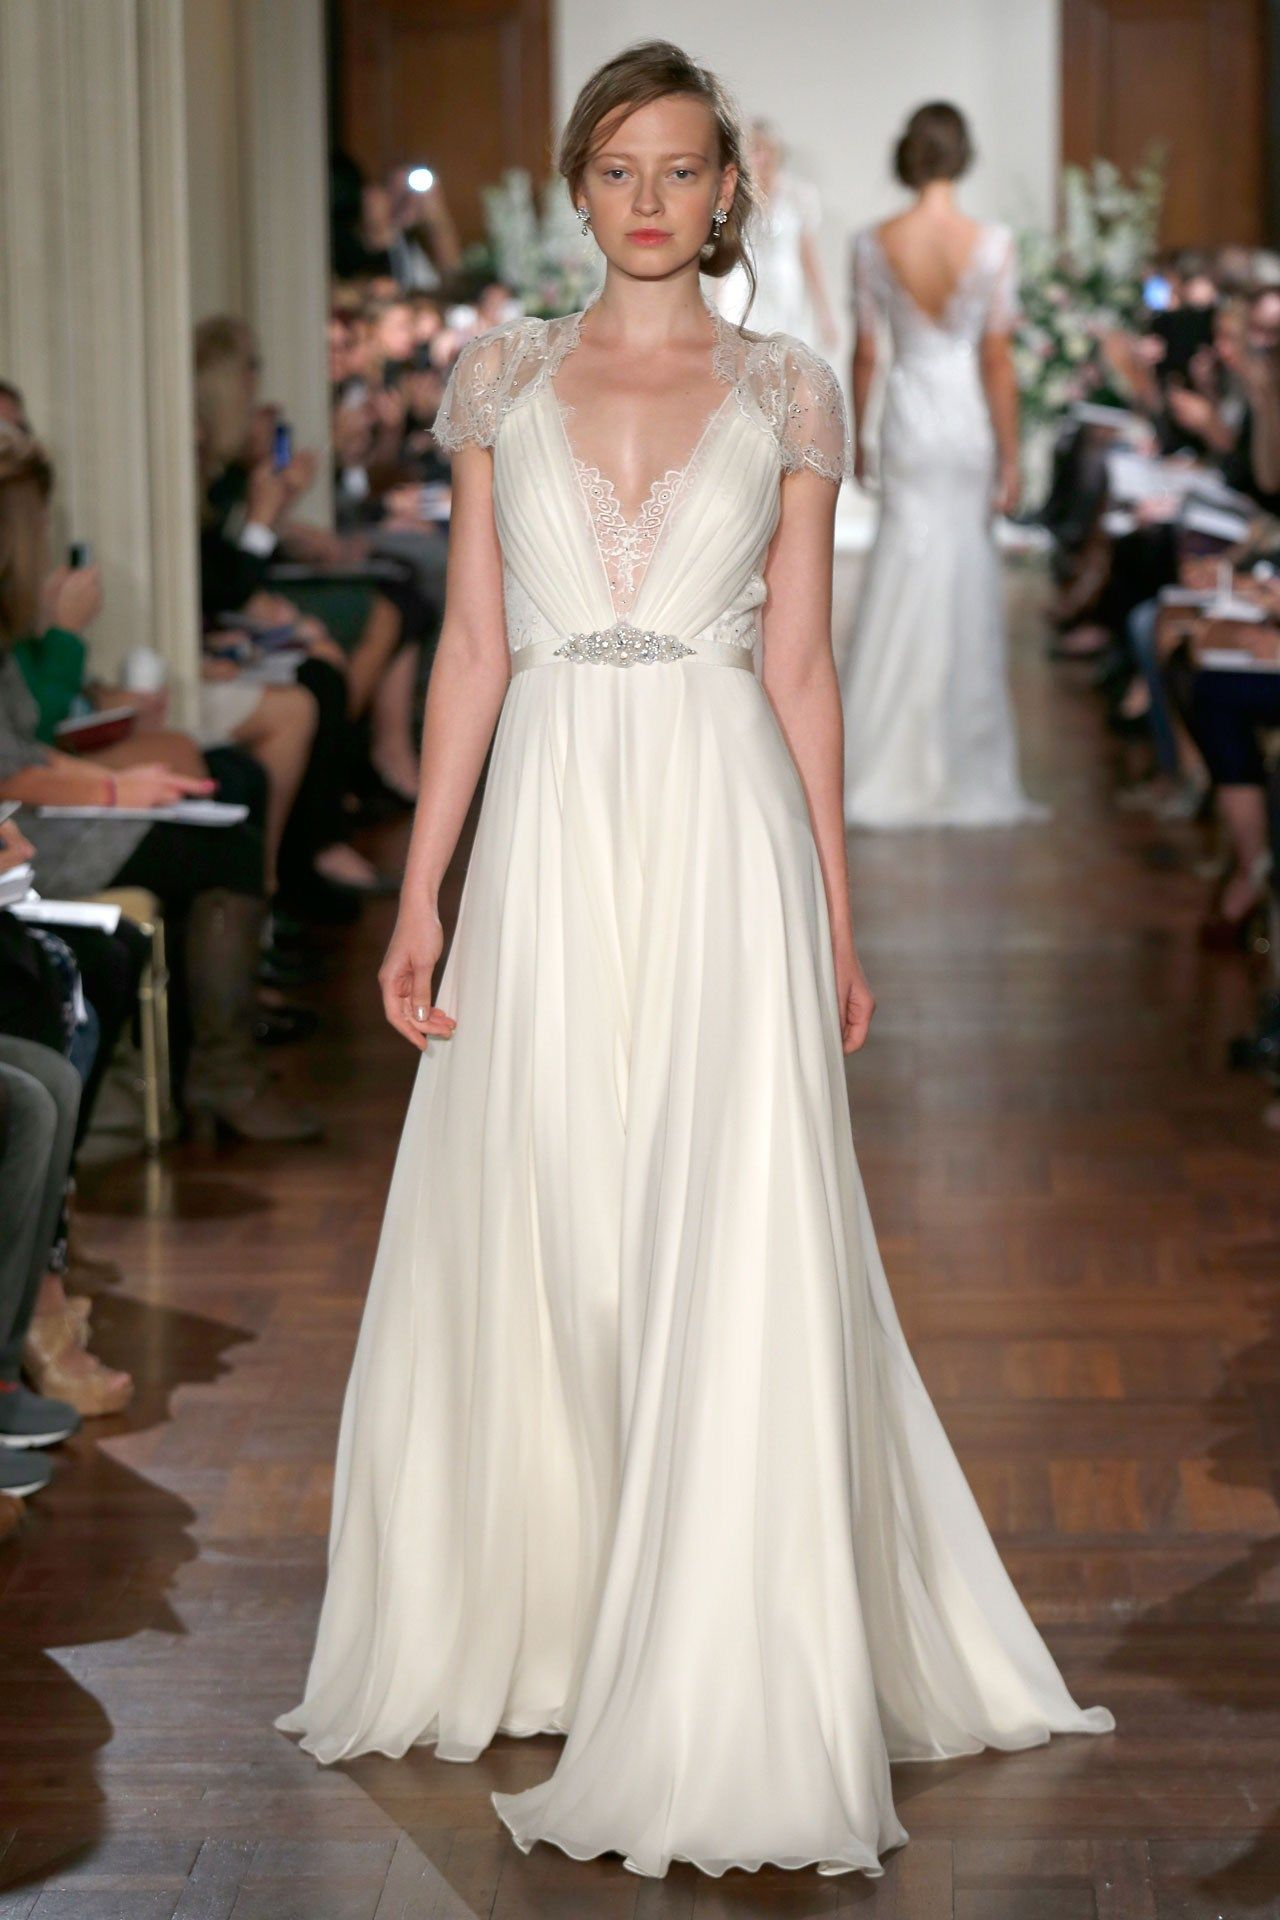 Wedding Dresses - The Ultimate Gallery (BridesMagazine.co.uk ... 975d3cdb4abe